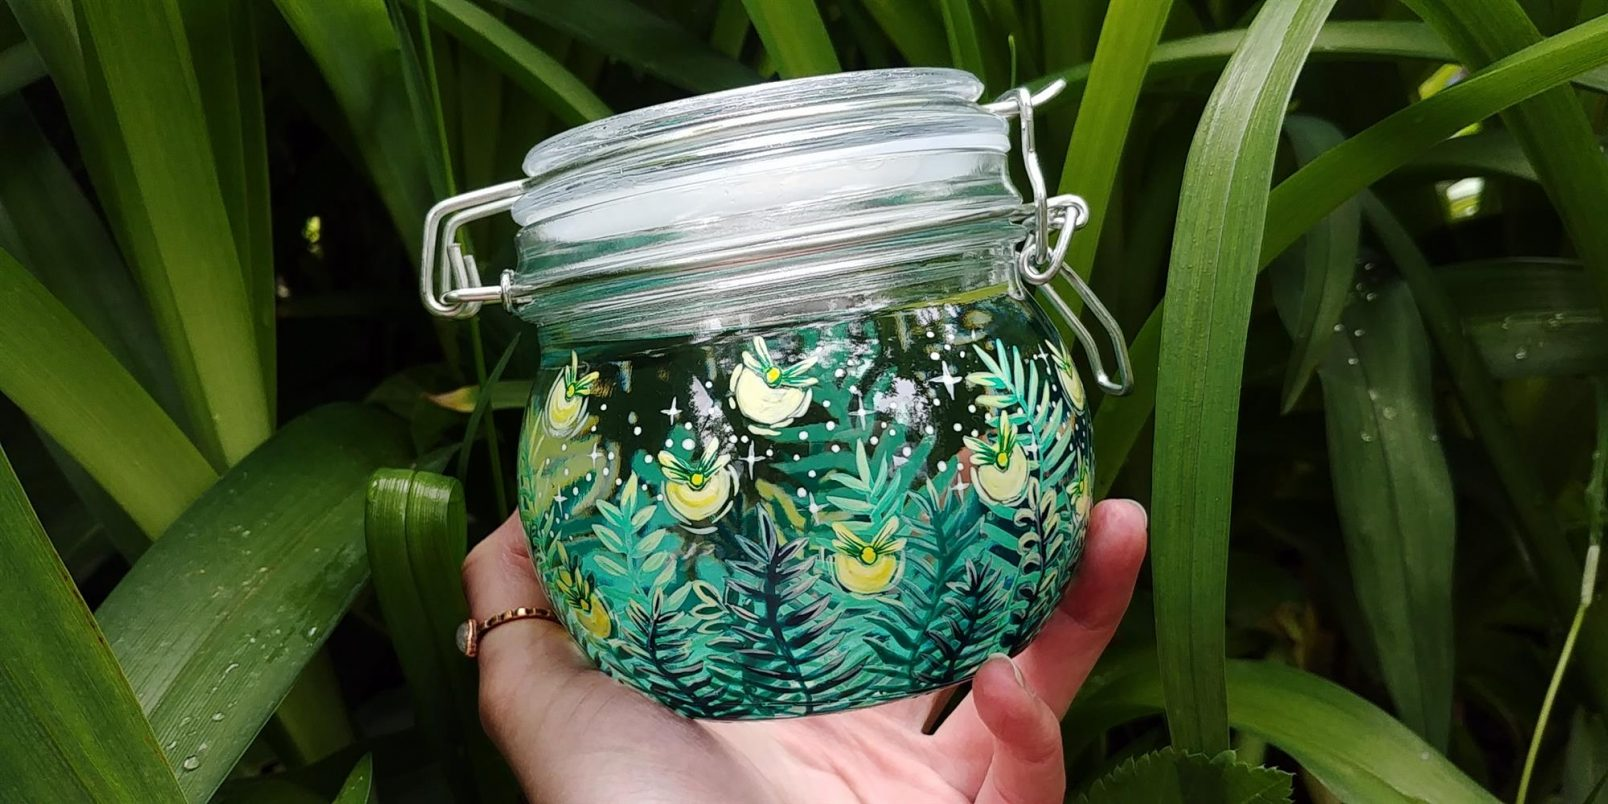 fireflies hand made jar marmelade gifts for her grandma birtdday gift, animal nature lovers gift botanic art